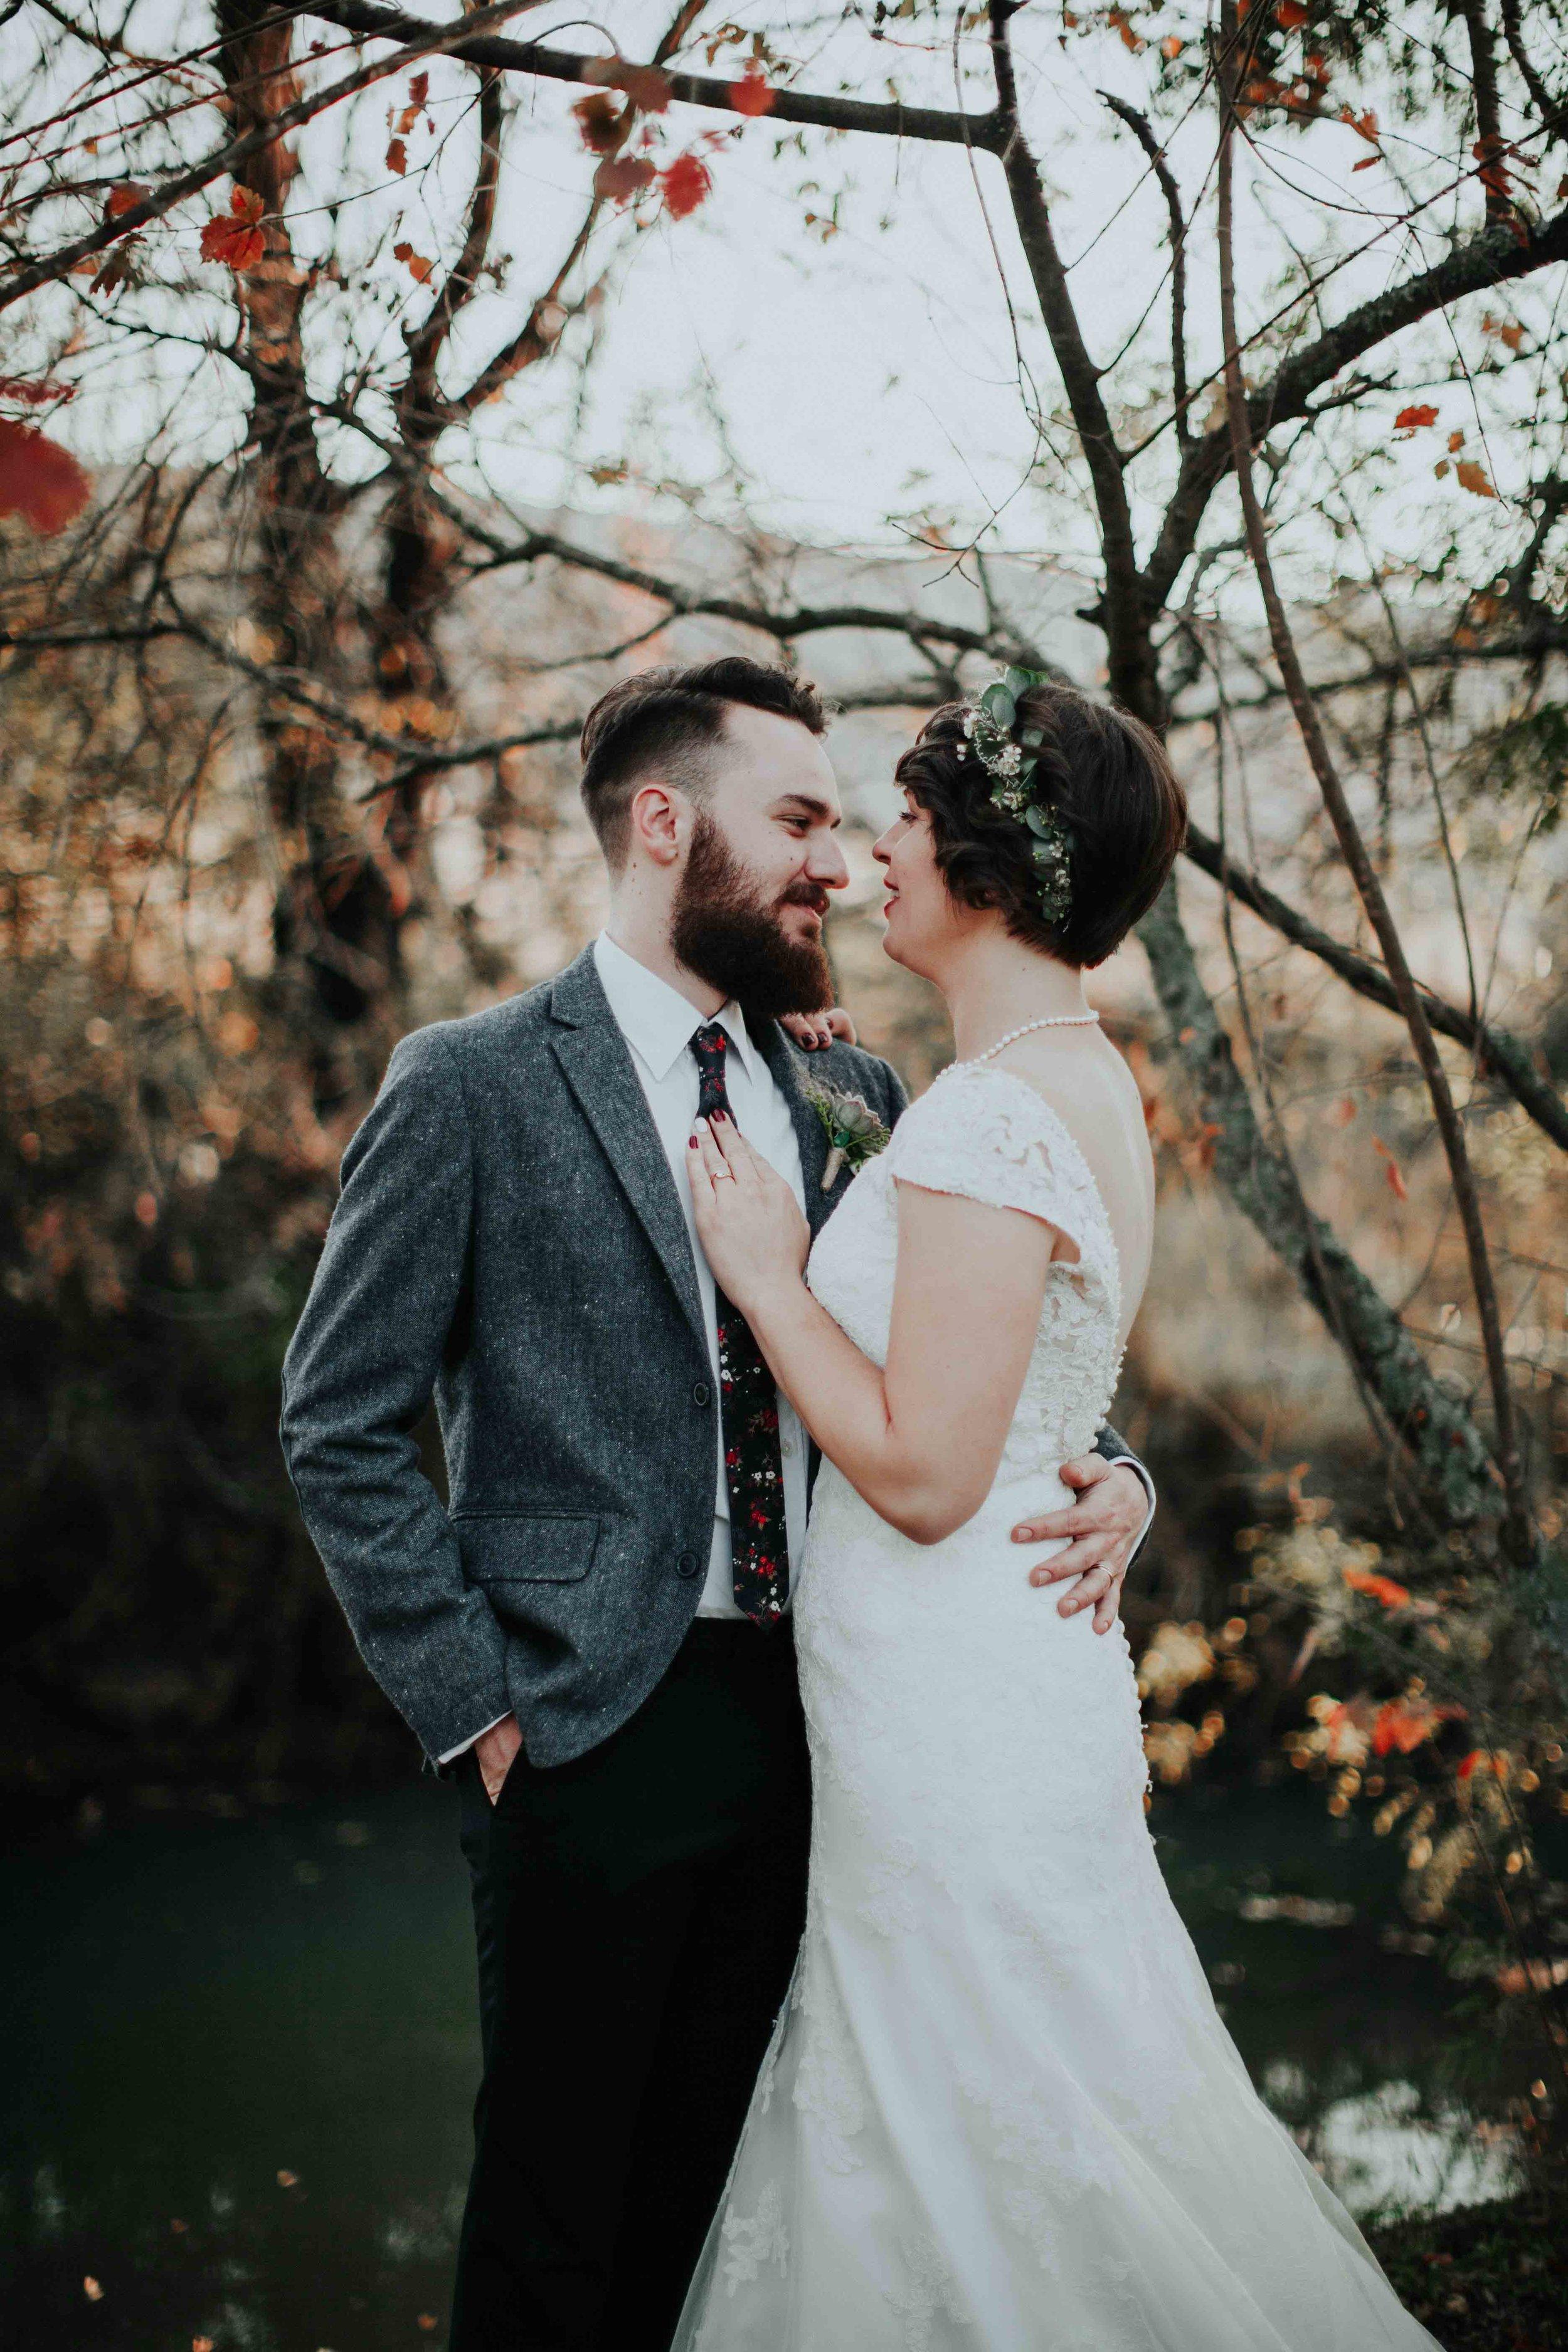 Kristi Smith Photography_Eloff&Jeanette_ Wedding Photographer 22.jpg